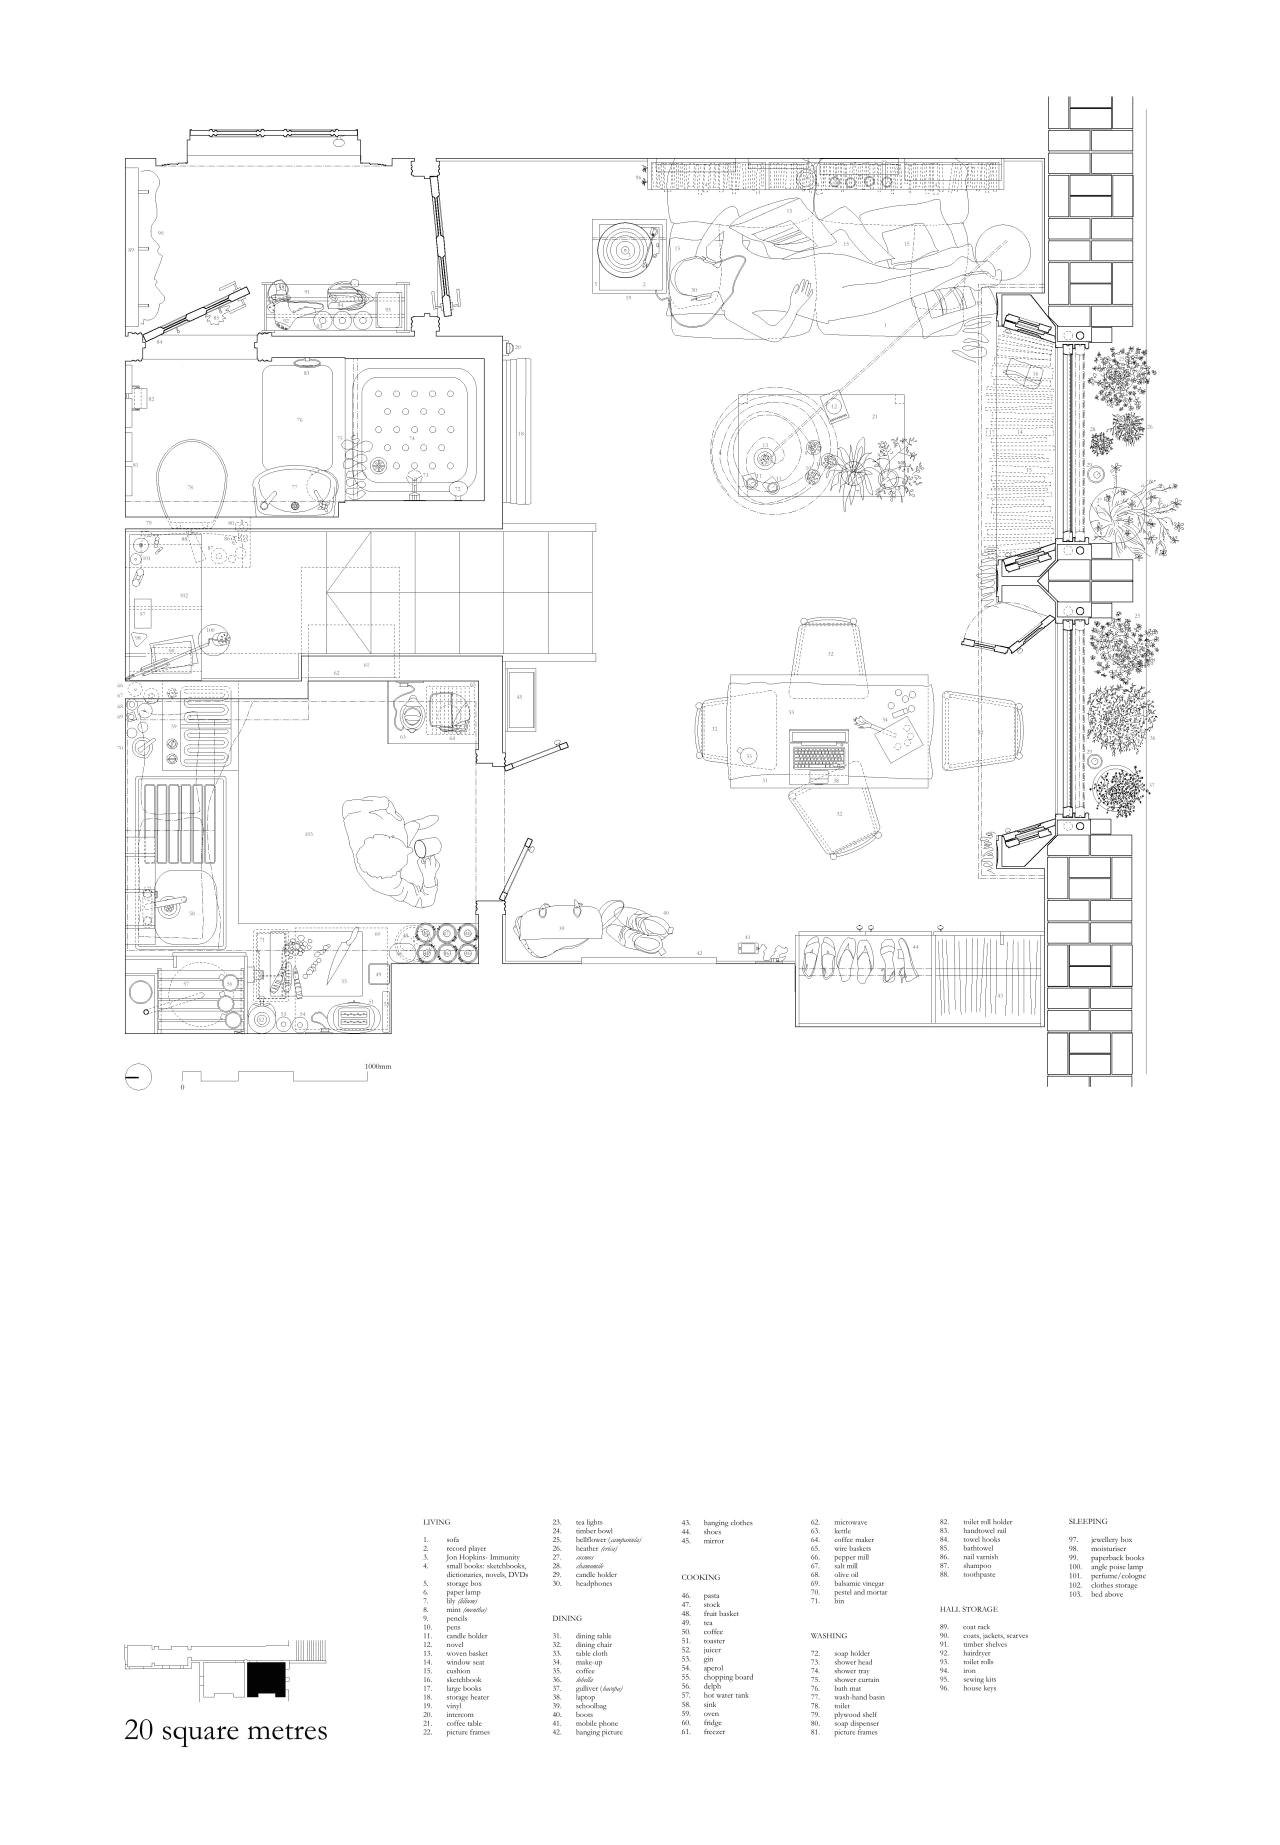 plattenbau studio architecture plan architecture drawings interior architecture architecture illustrations design process